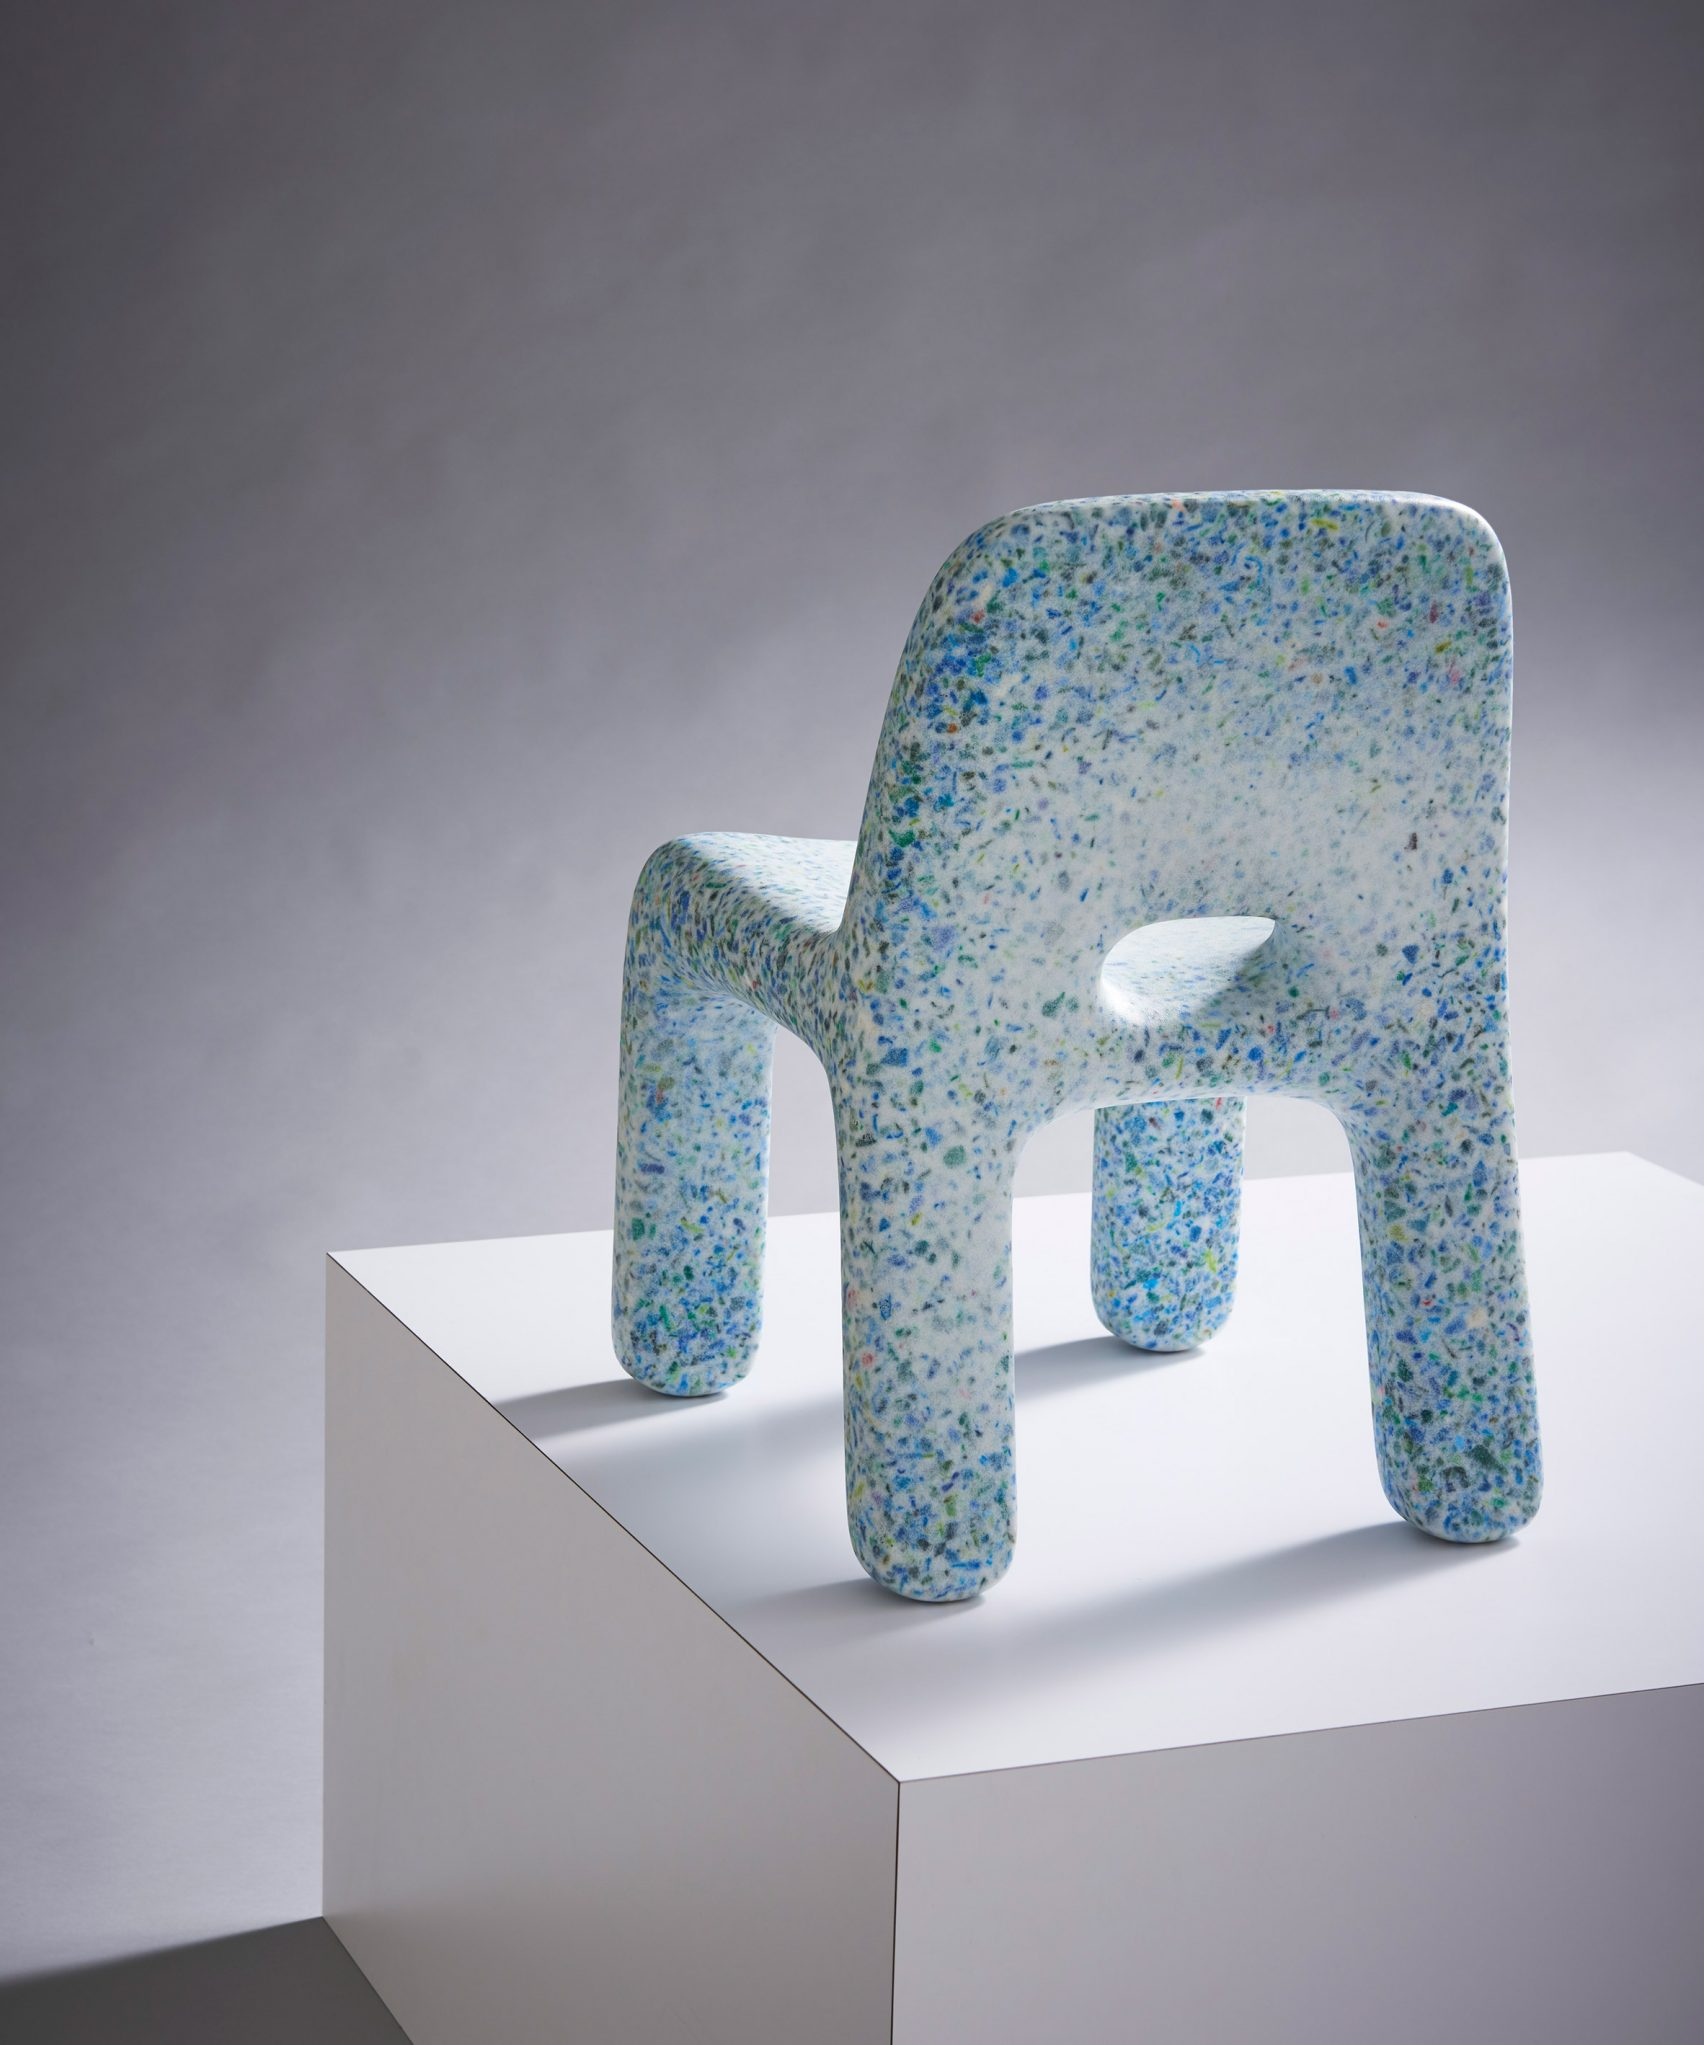 ecobirdy-childrens-furniture-design-maison-objet-recycled-plastic_dezeen_2364_col_2-1704x2045